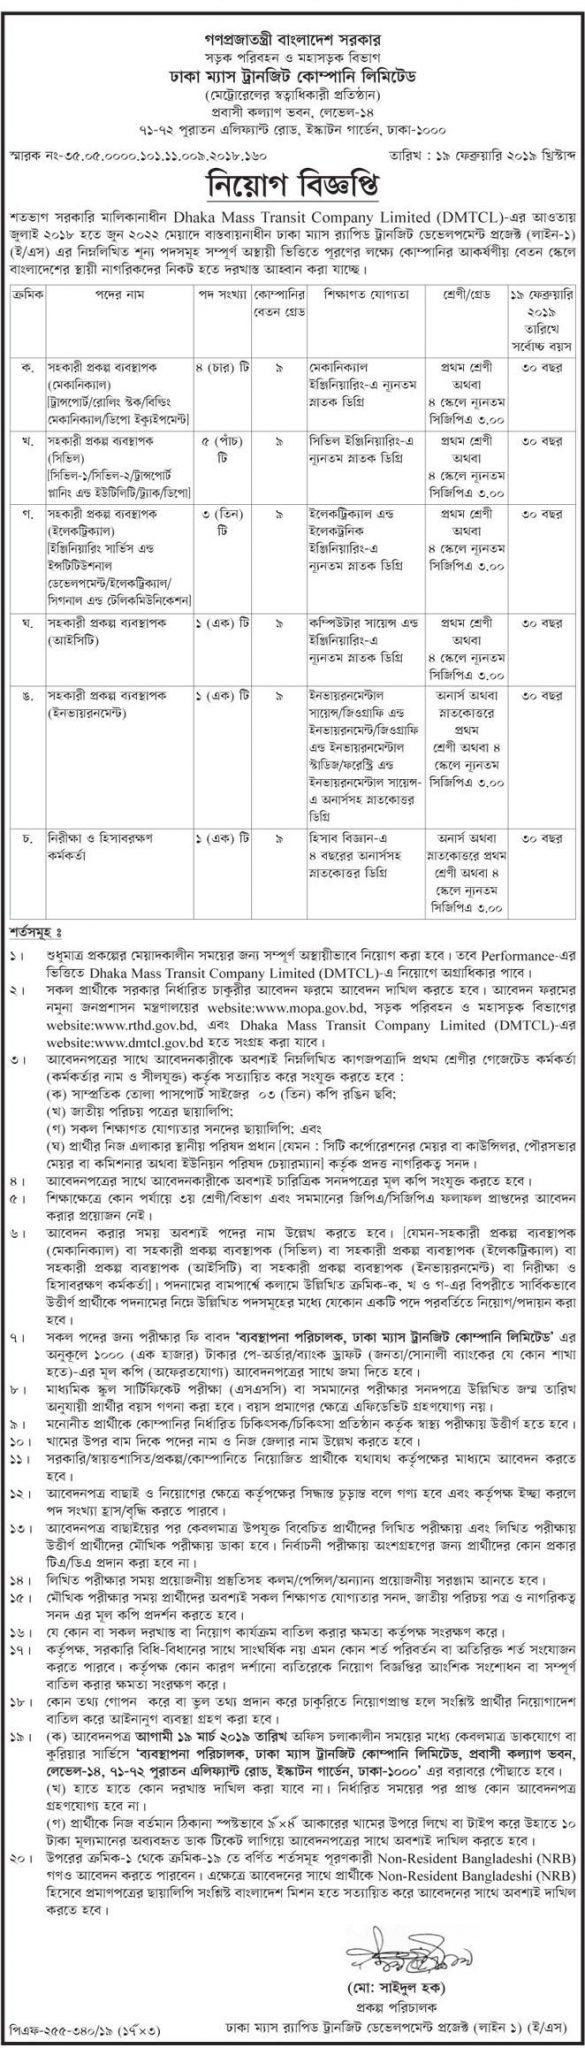 Dhaka Mass Transit Company Limited job circular 2019